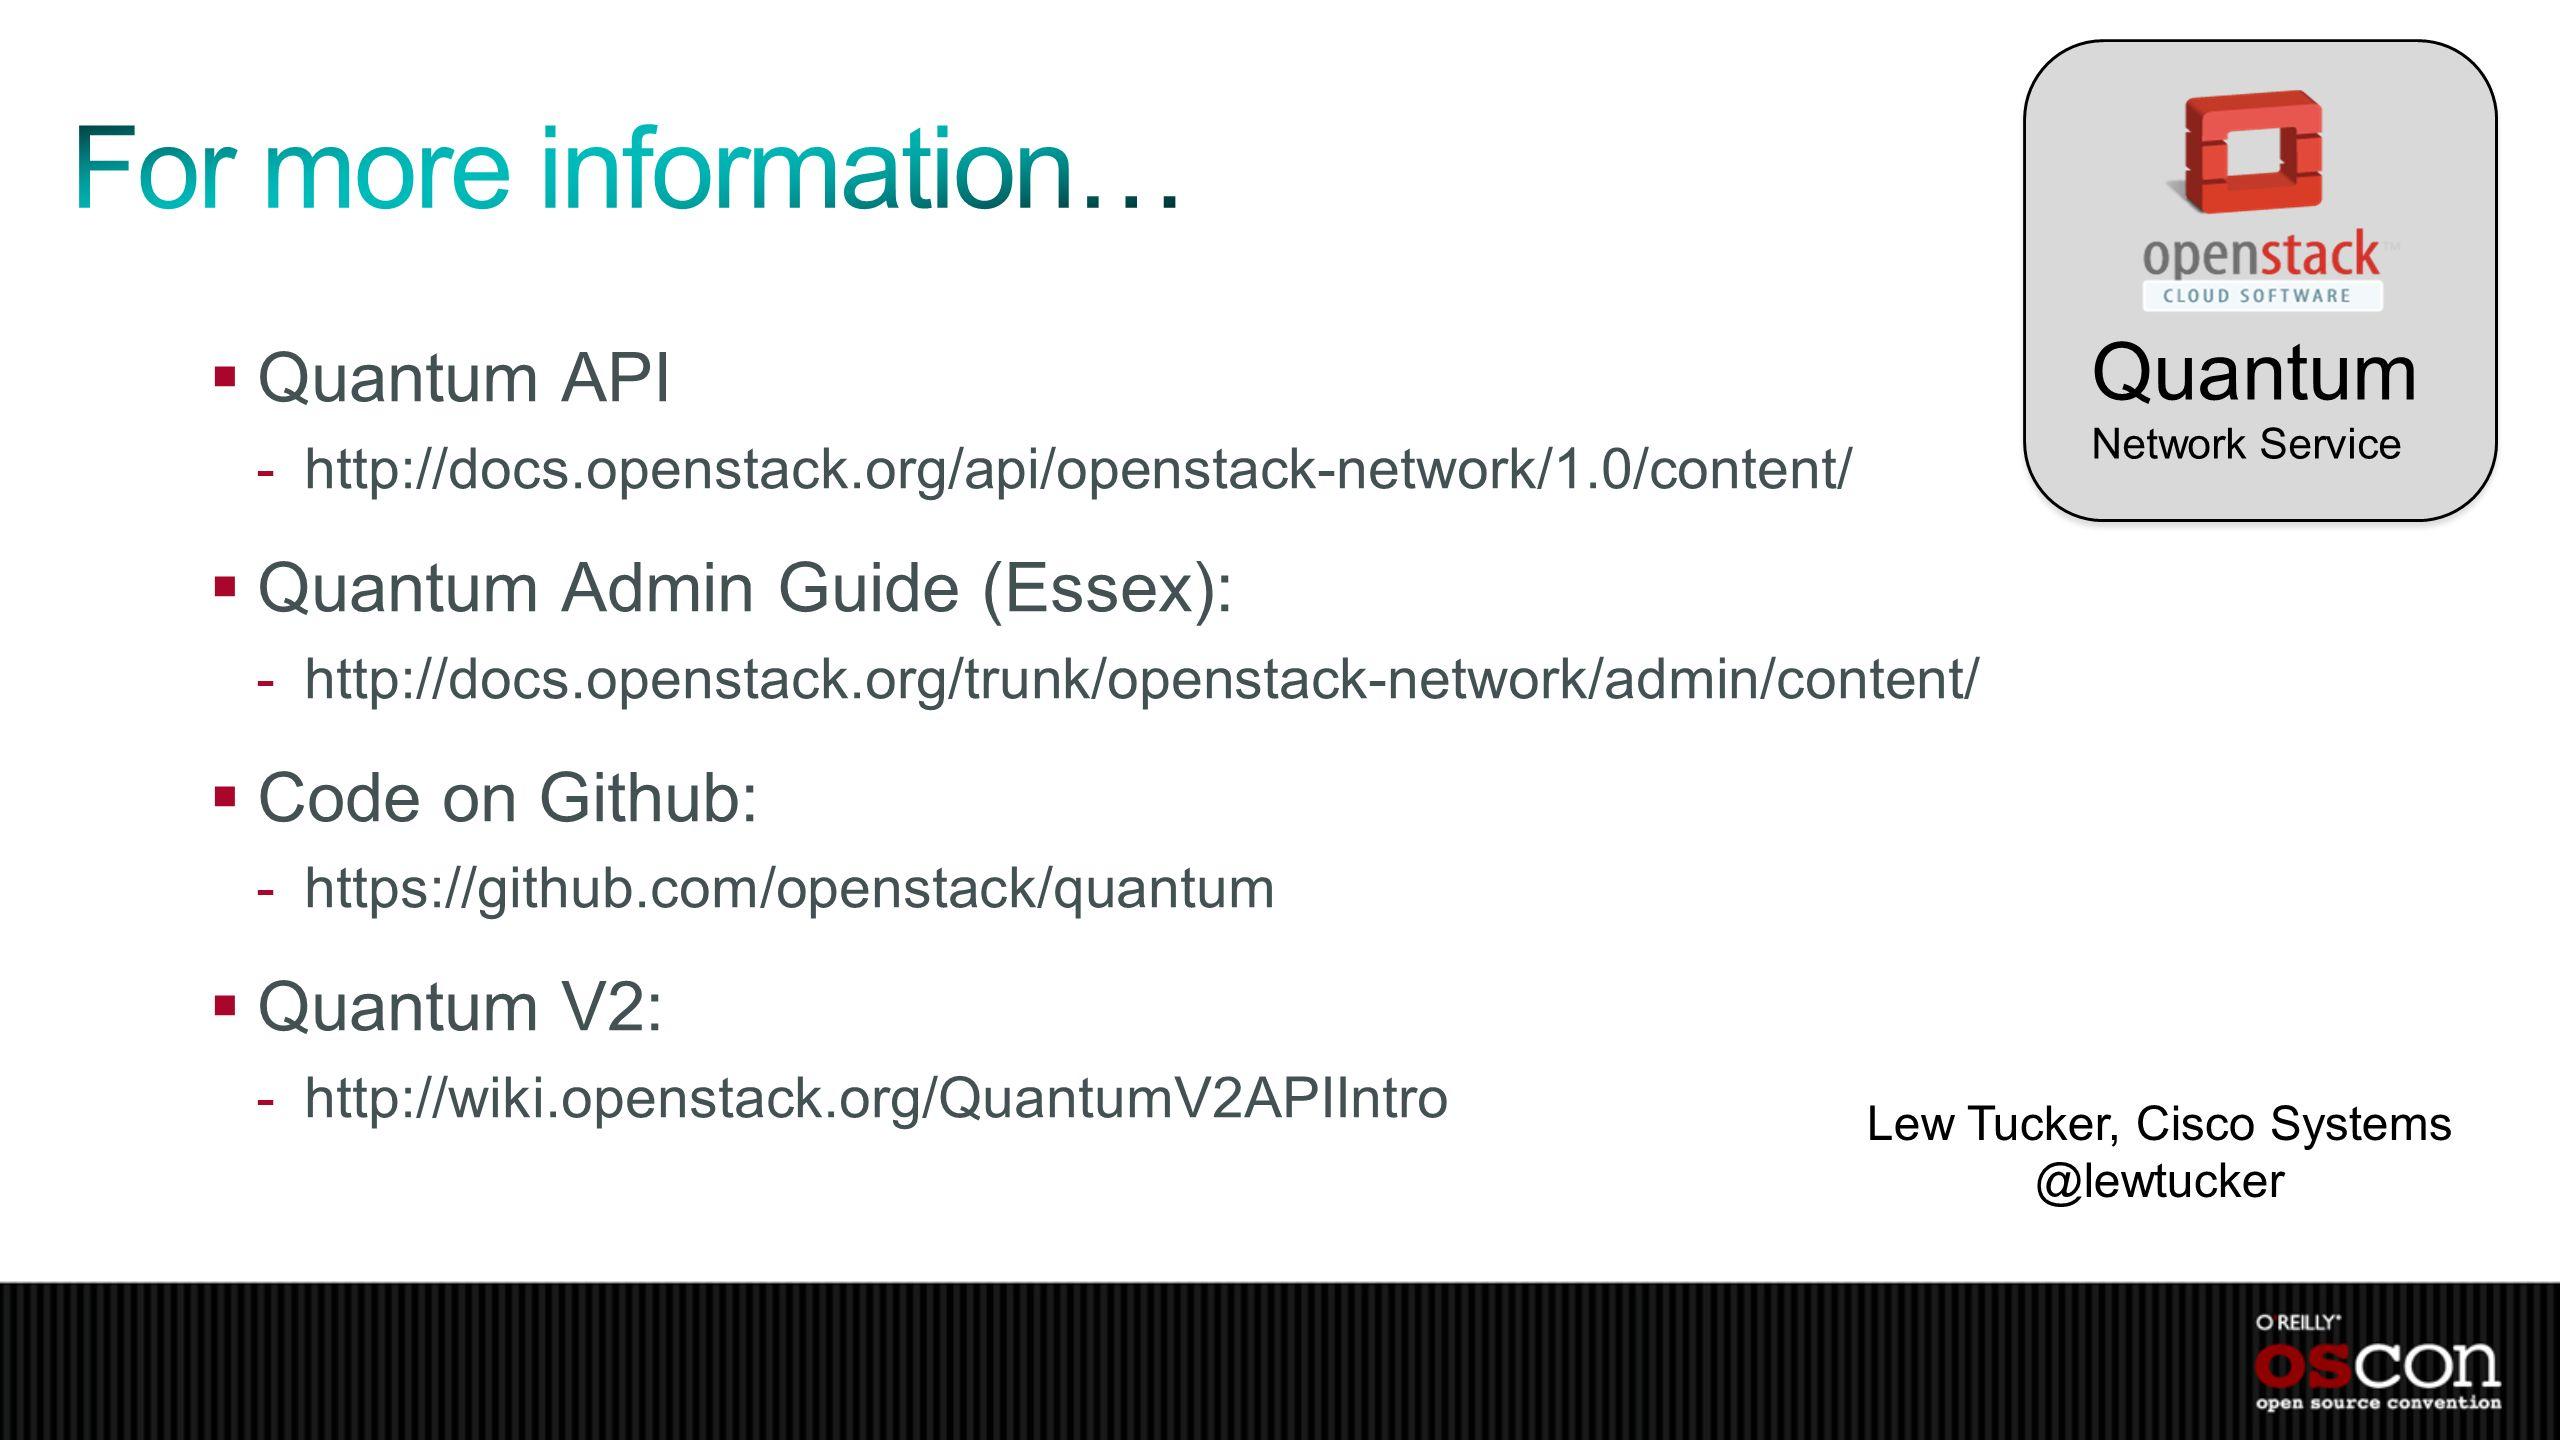 Quantum API -http://docs.openstack.org/api/openstack-network/1.0/content/ Quantum Admin Guide (Essex): -http://docs.openstack.org/trunk/openstack-netw